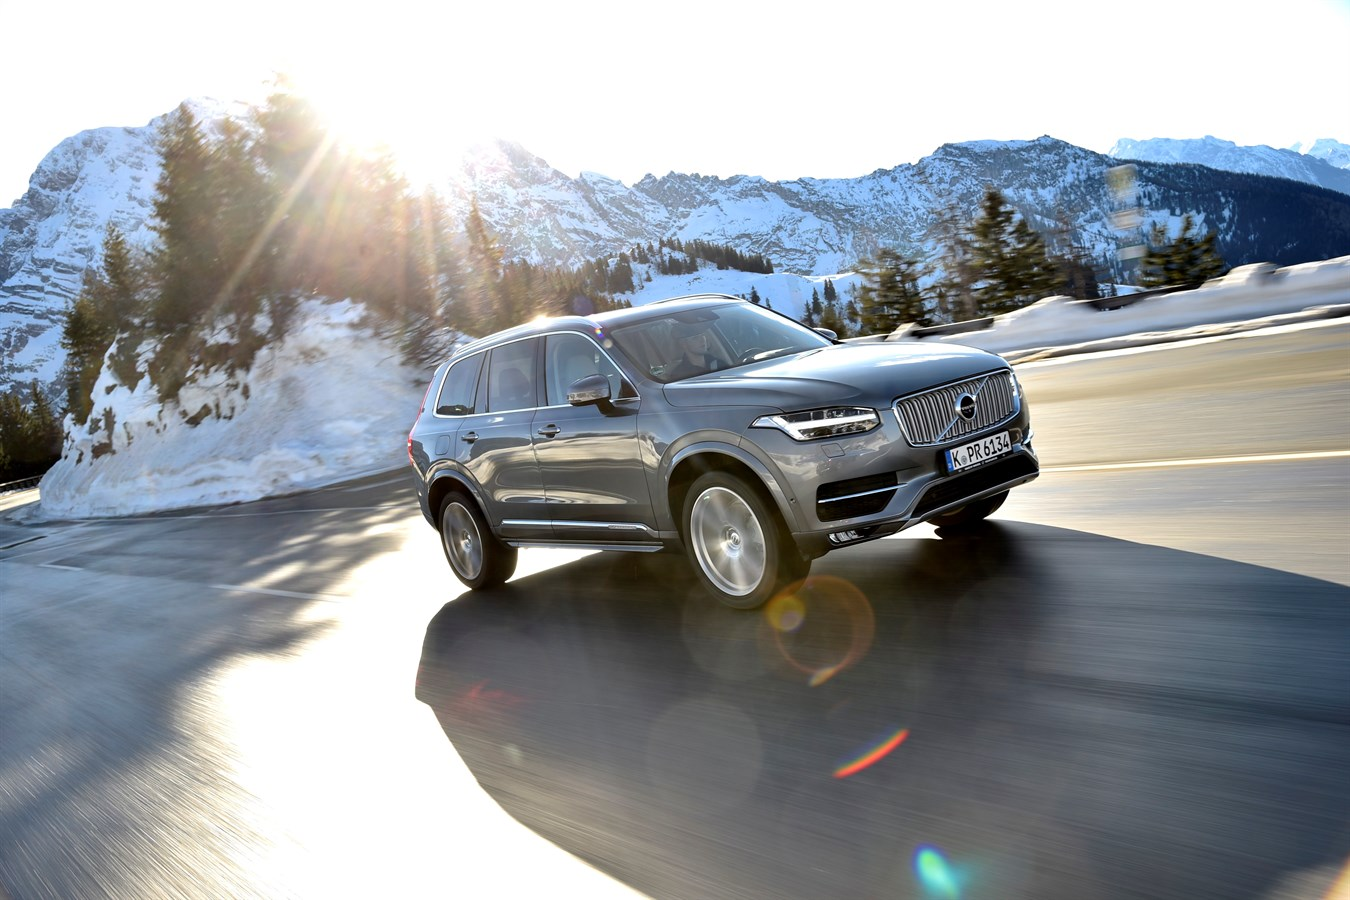 Volvo XC90 Inscription AWD - model year 2017